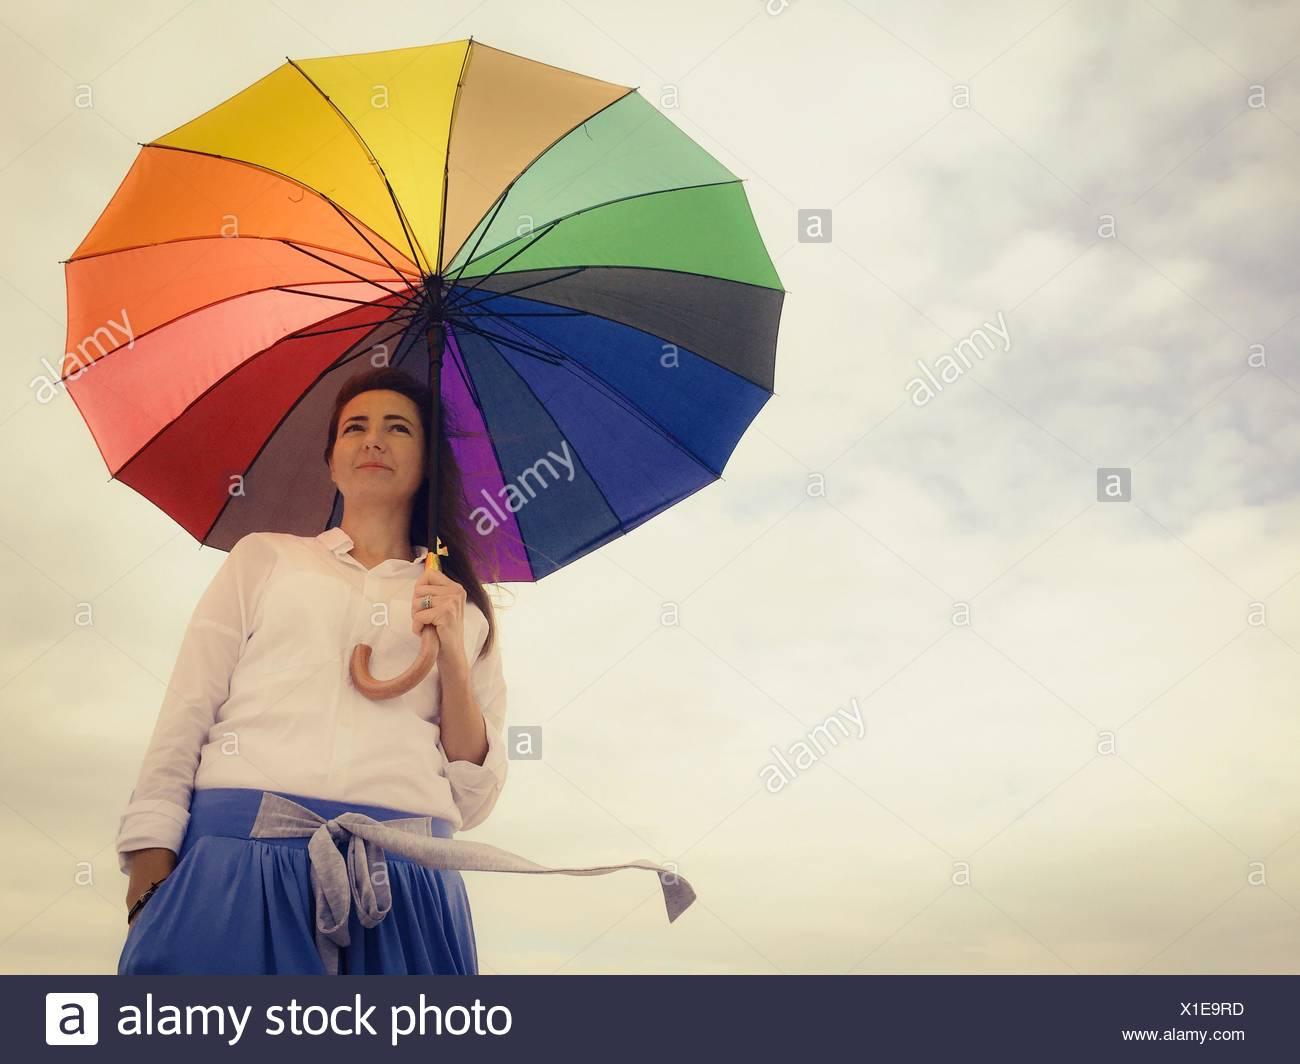 Niedrigen Winkel Blick auf schöne Frau mit Regenschirm bunt gegen bewölktem Himmel Stockbild